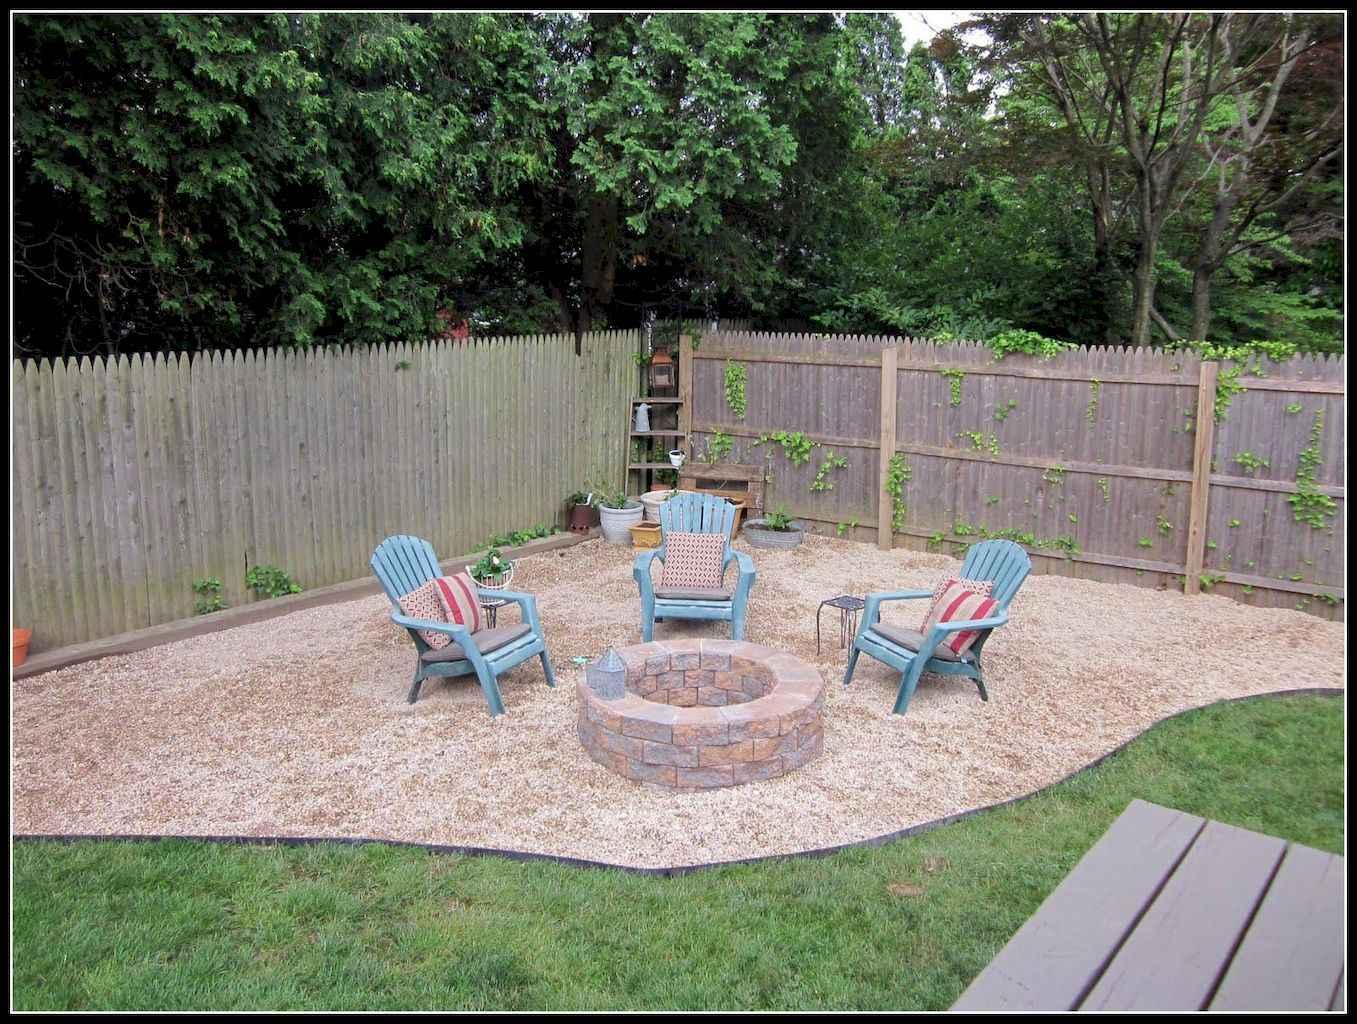 60 Beautiful Backyard Fire Pit Ideas Decoration and Remodel (55)